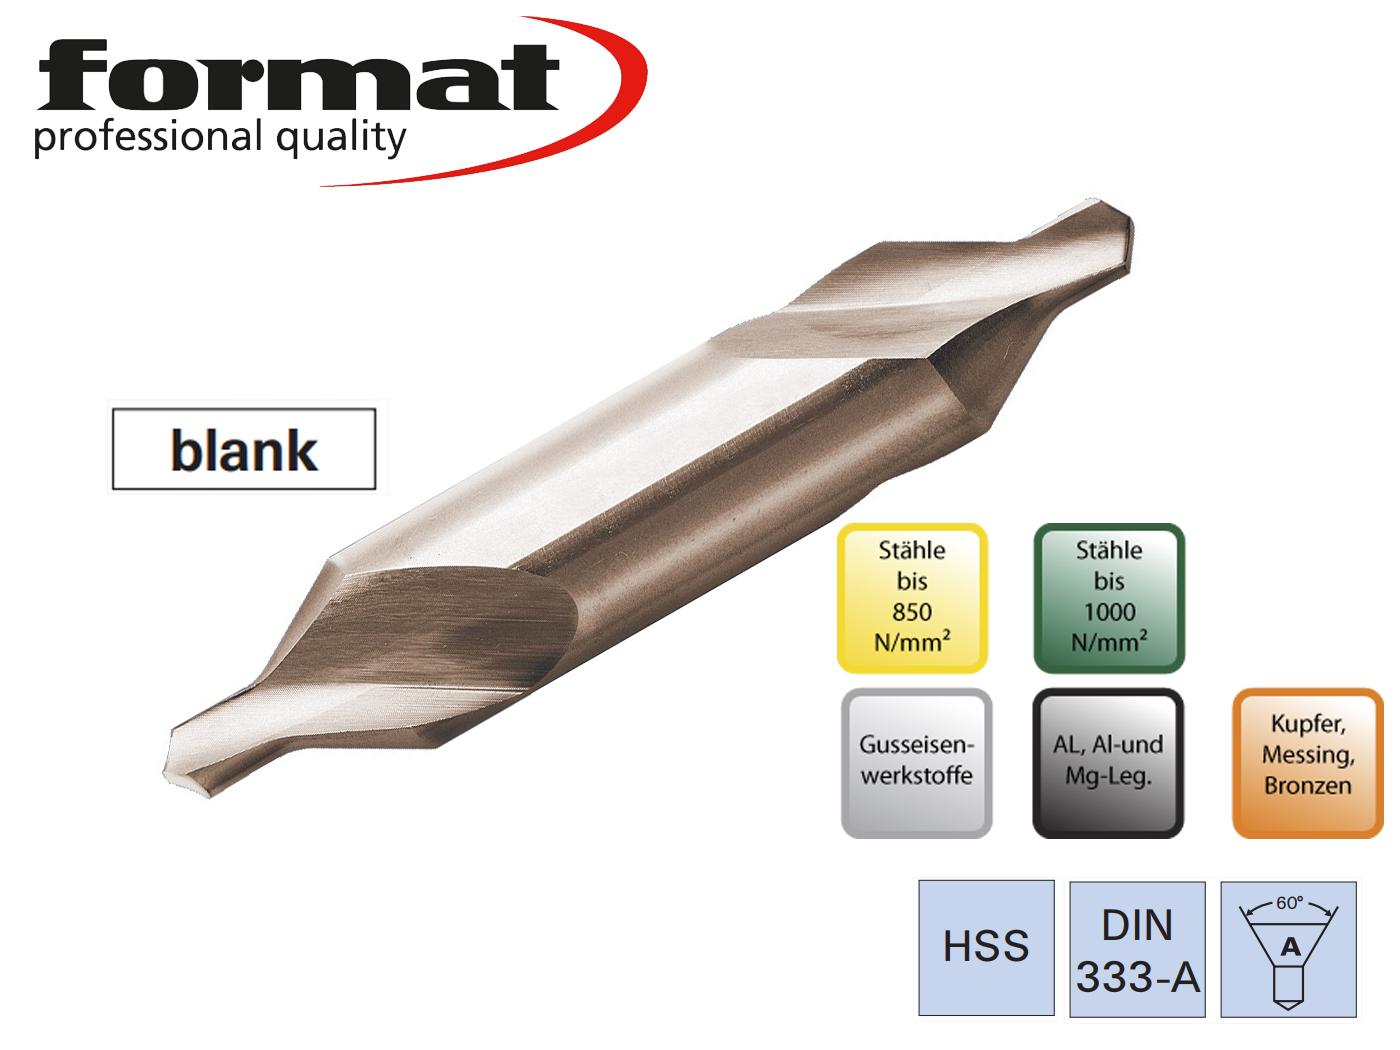 Centreerboren DIN 333 A HSS FORMAT | DKMTools - DKM Tools